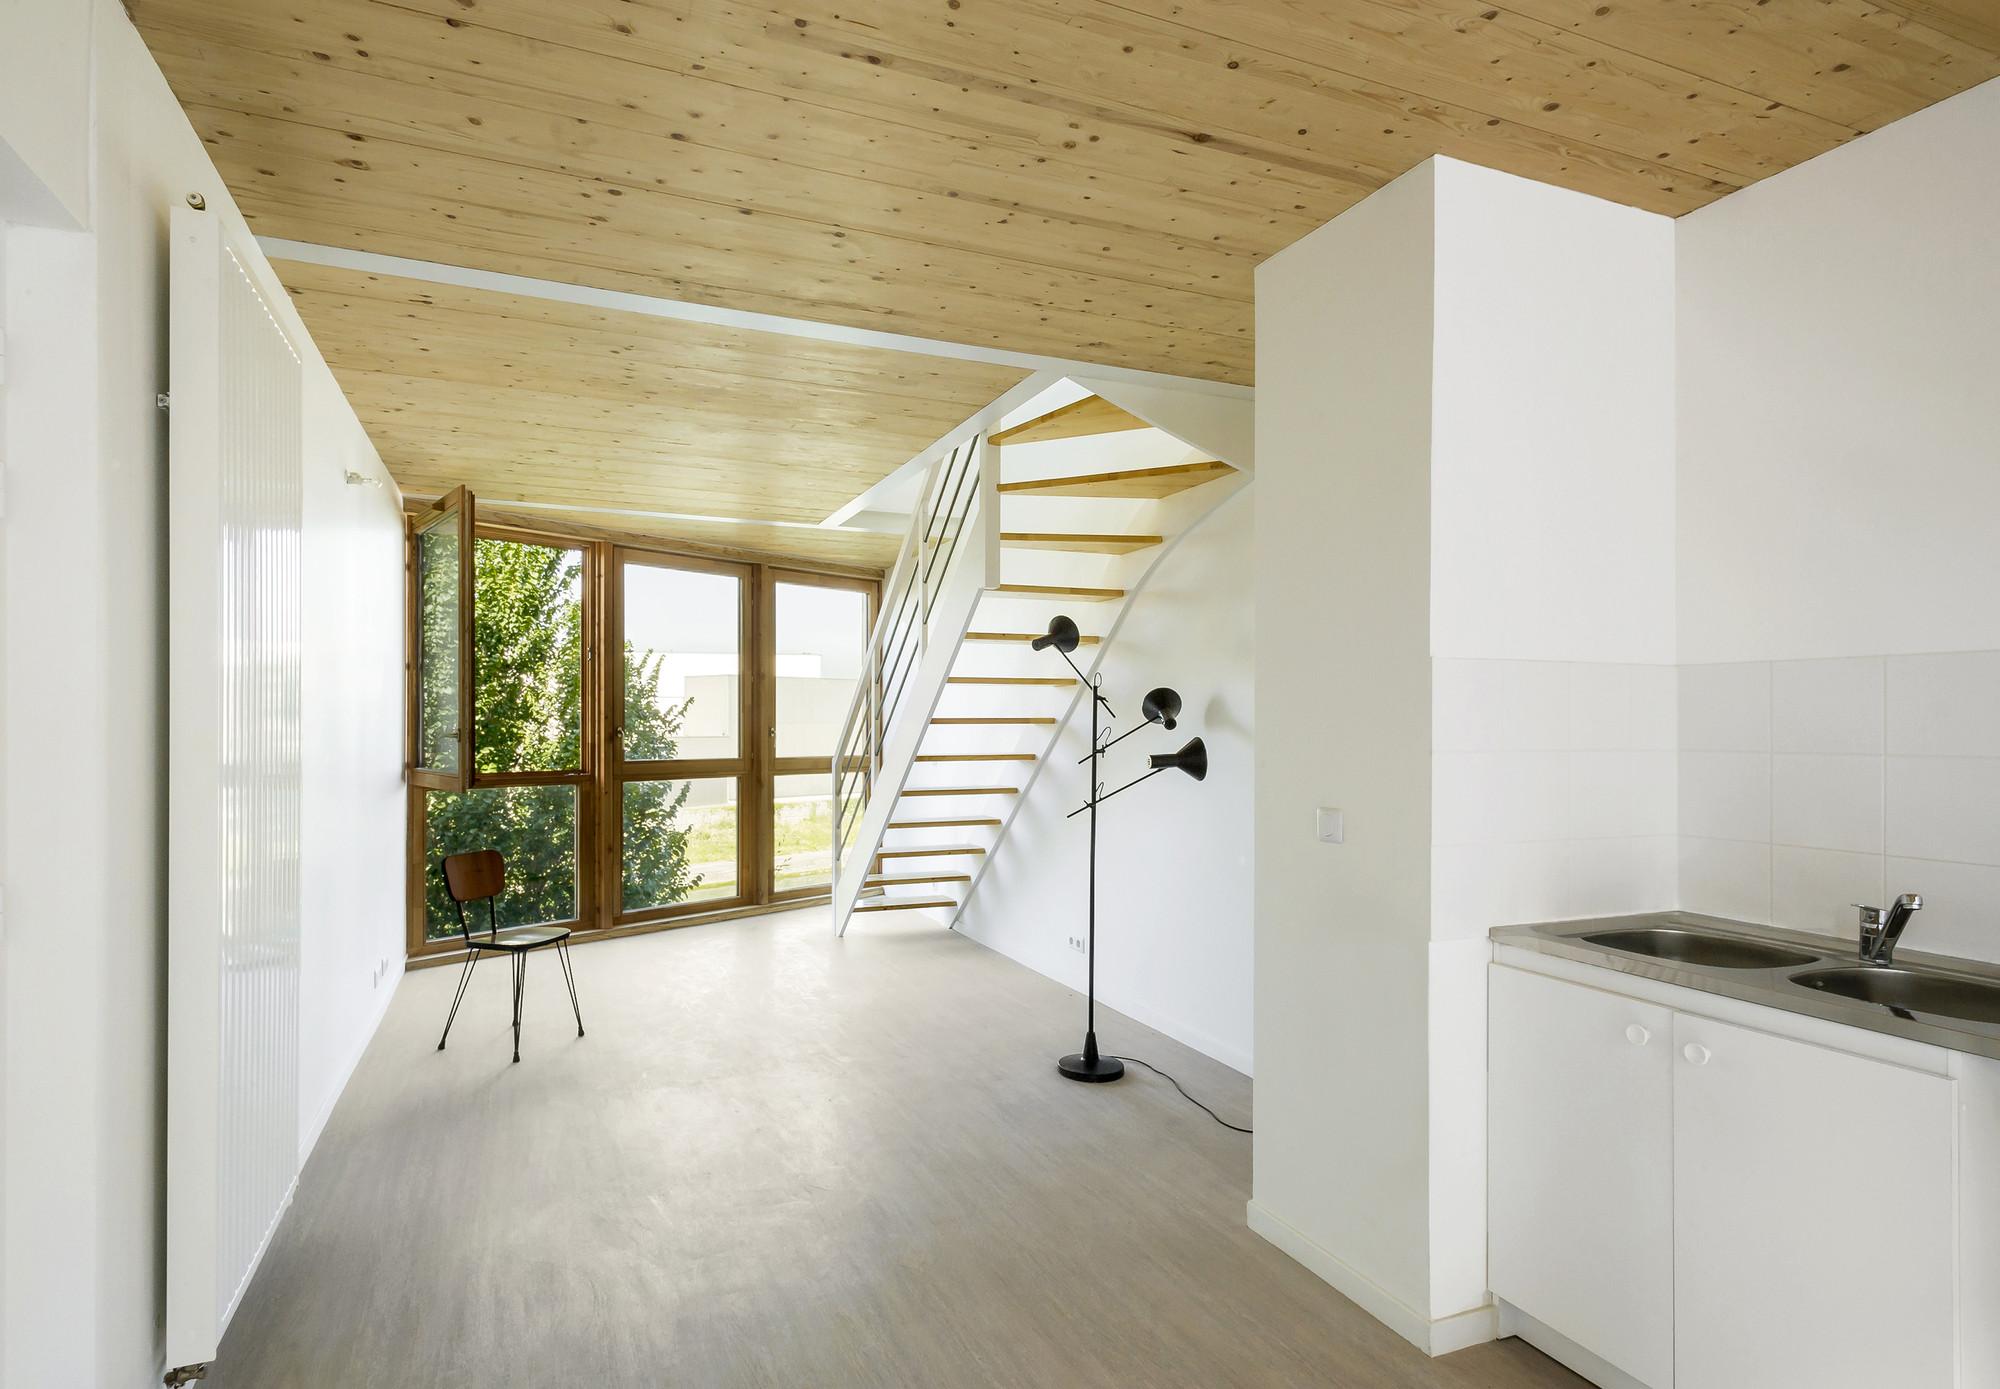 galer a de au bon coin ramdam architectes 15. Black Bedroom Furniture Sets. Home Design Ideas